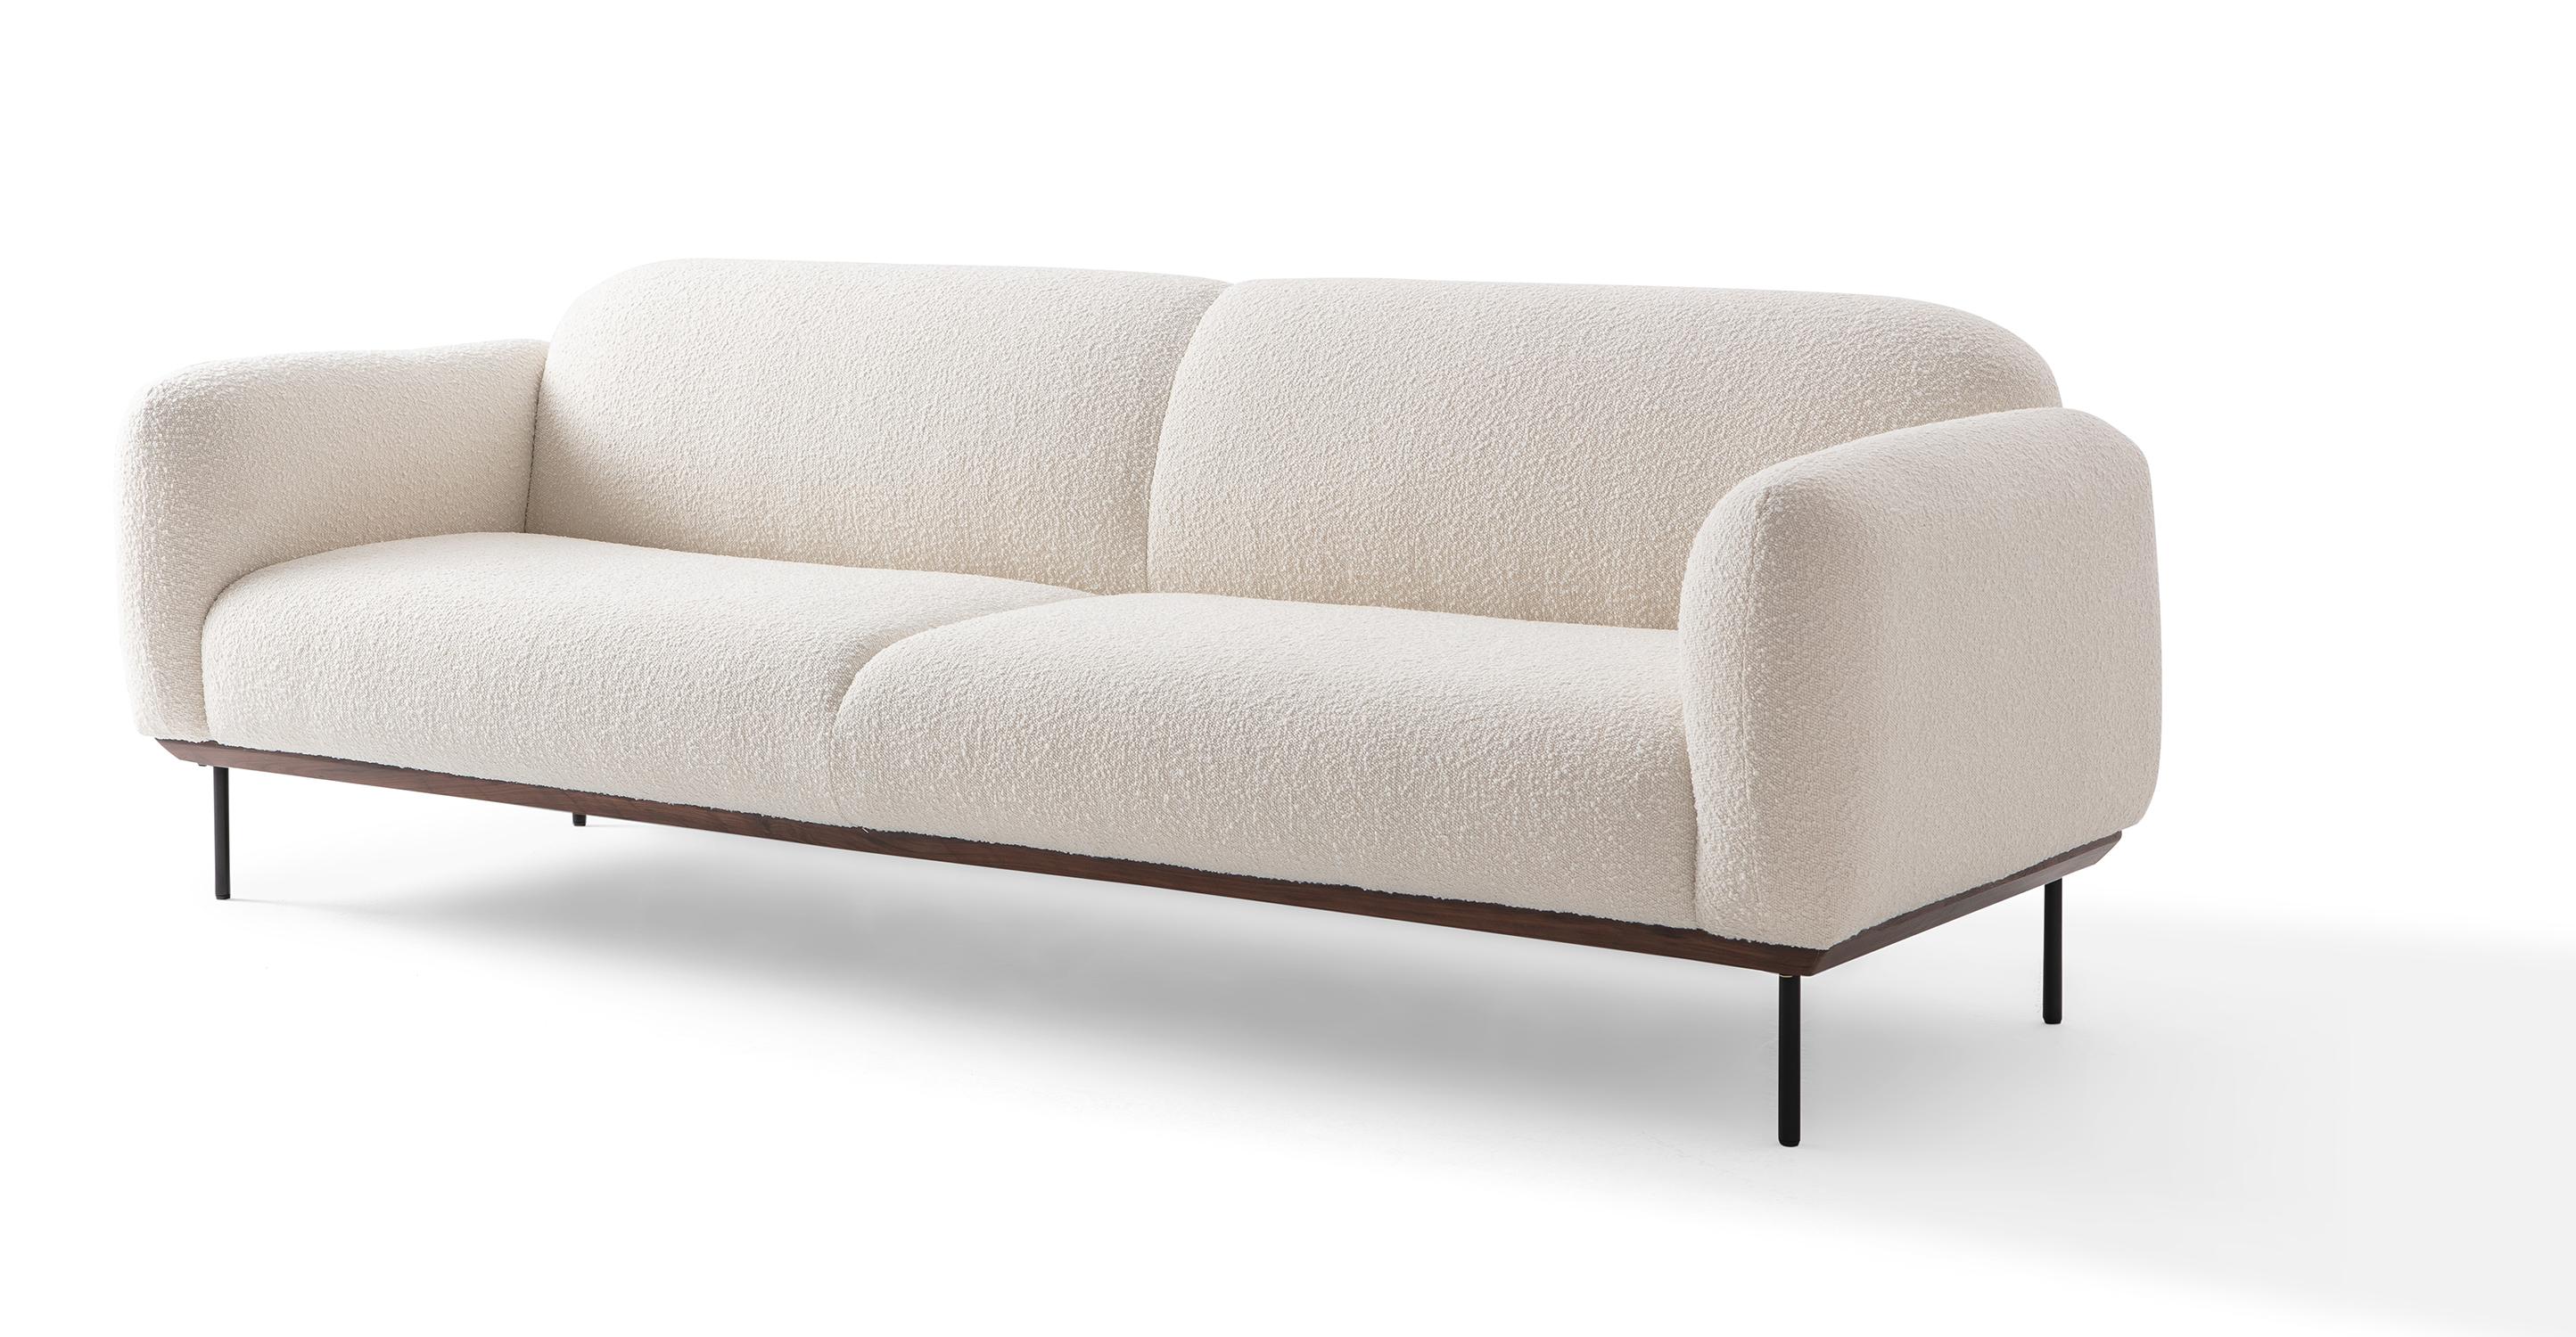 "Cloud 90"" Fabric Sofa, Blanc Boucle"